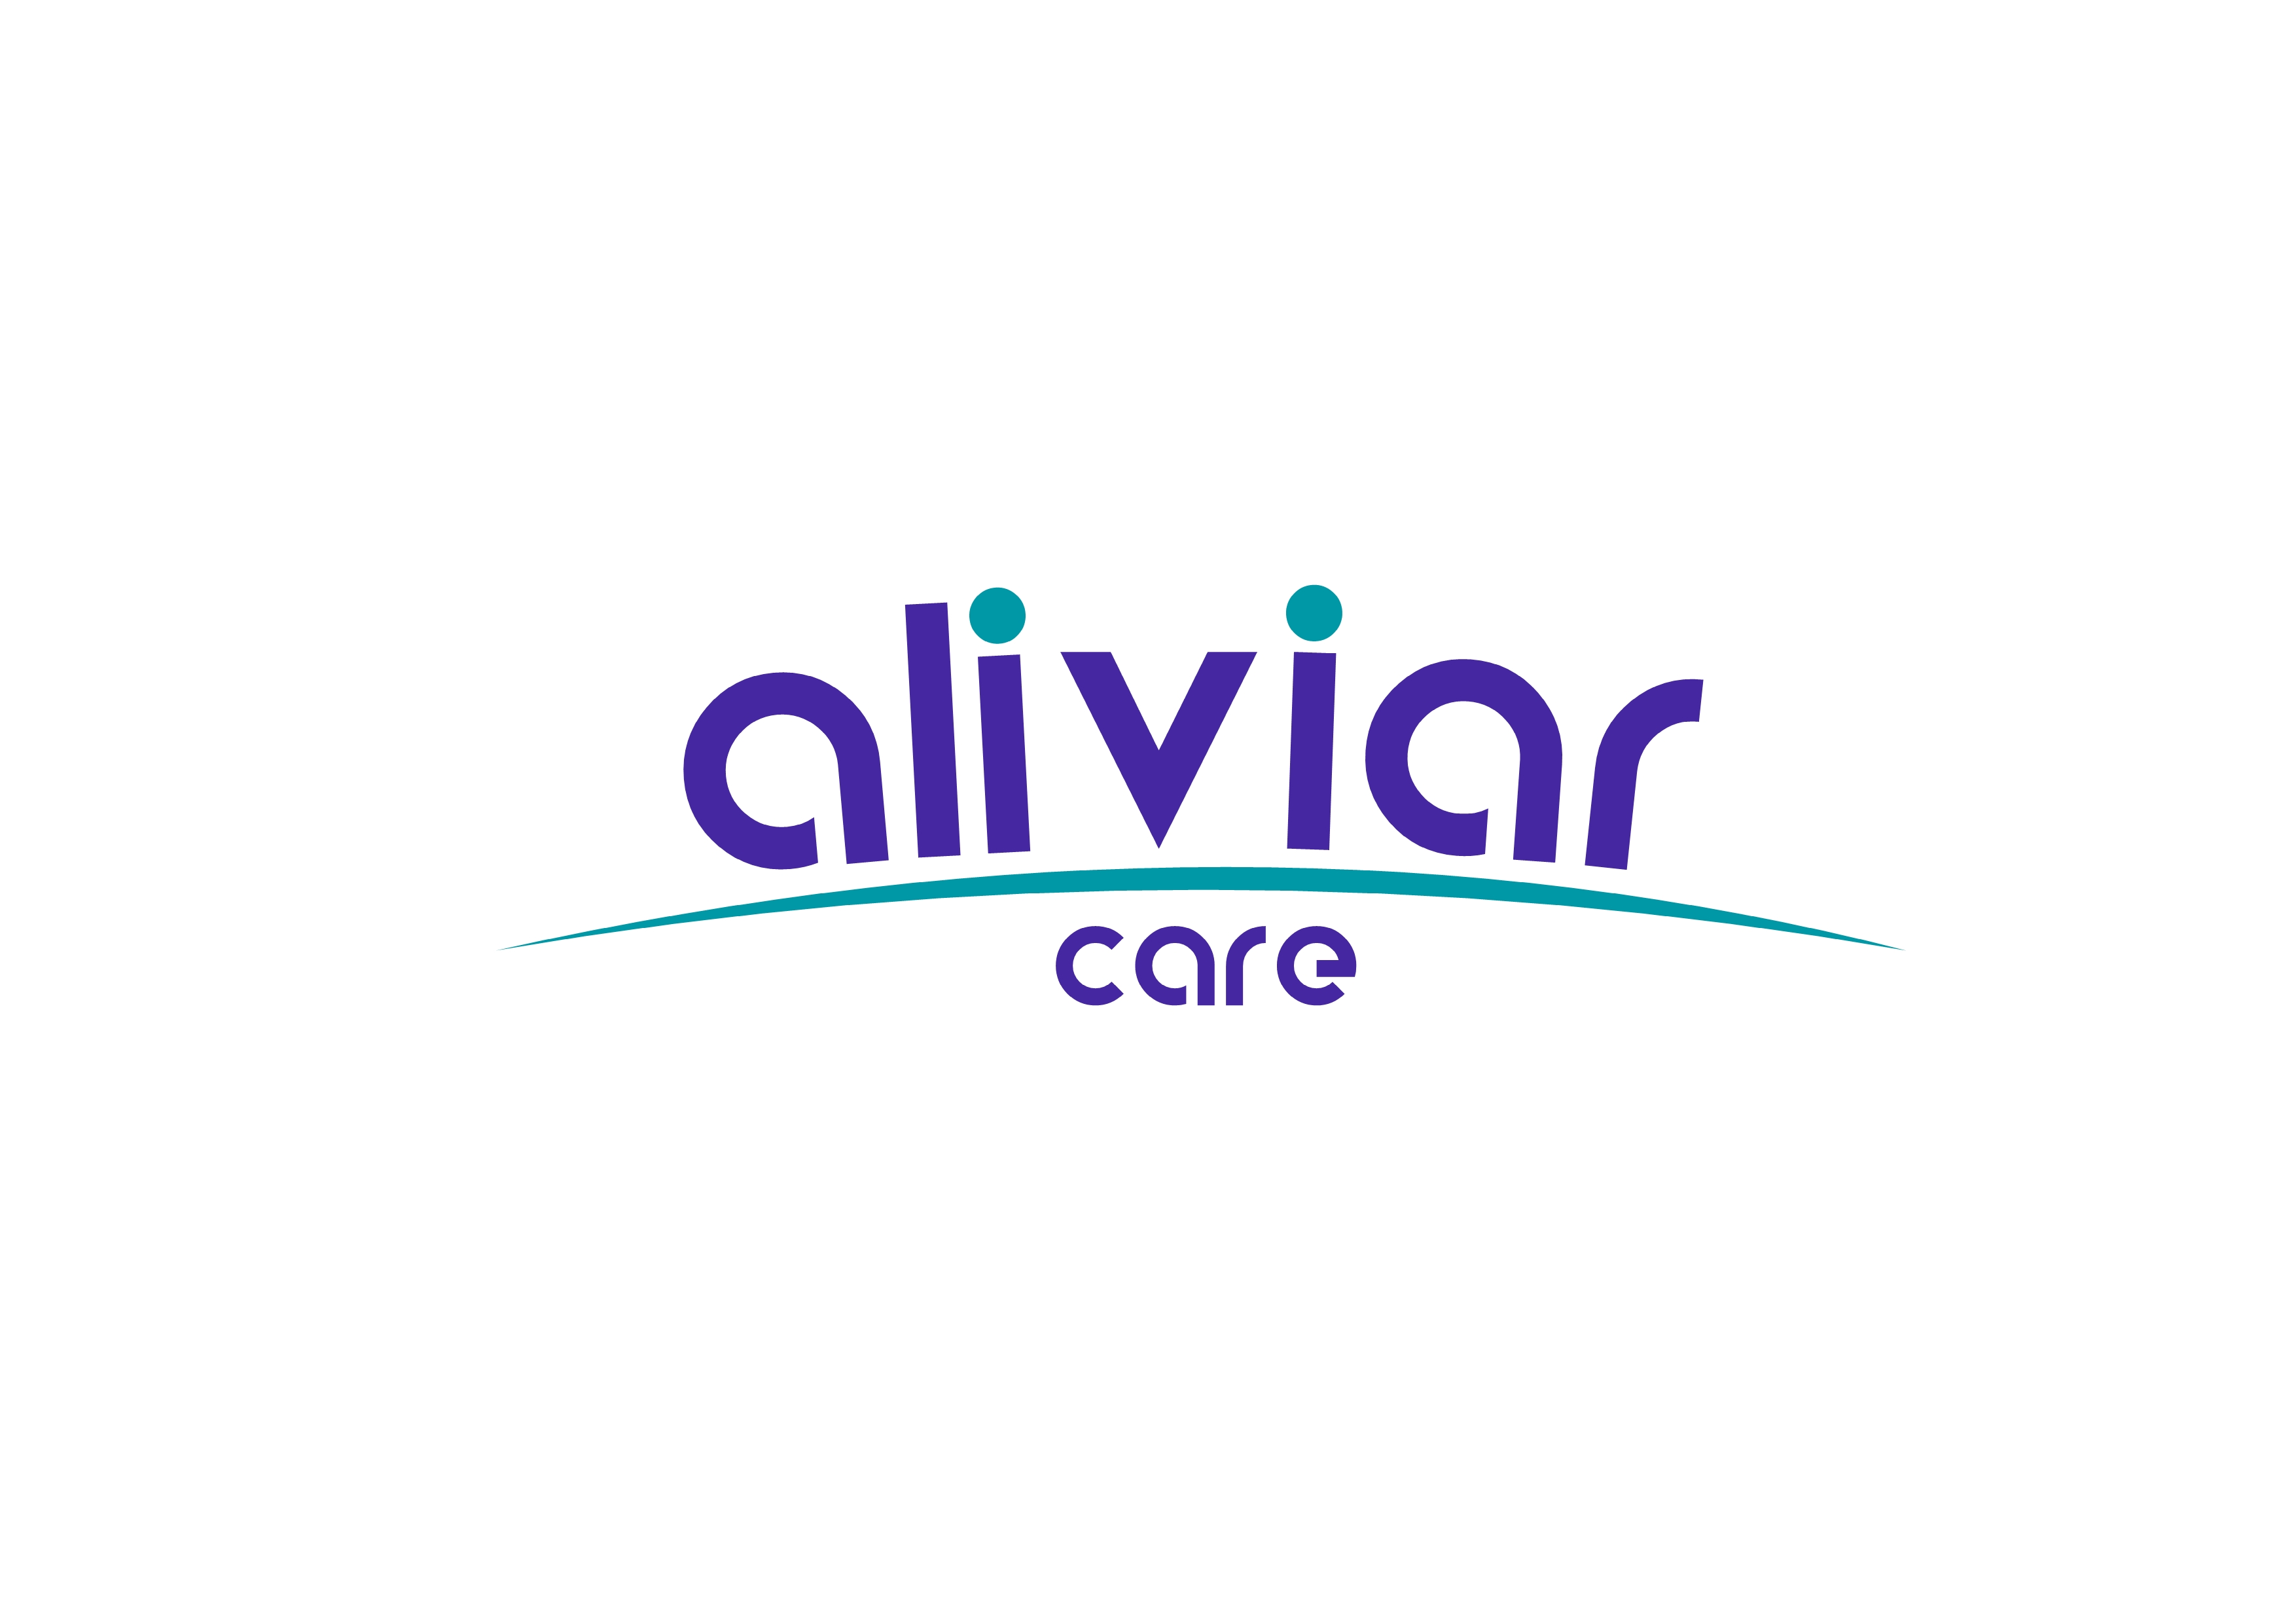 Aliviar Care